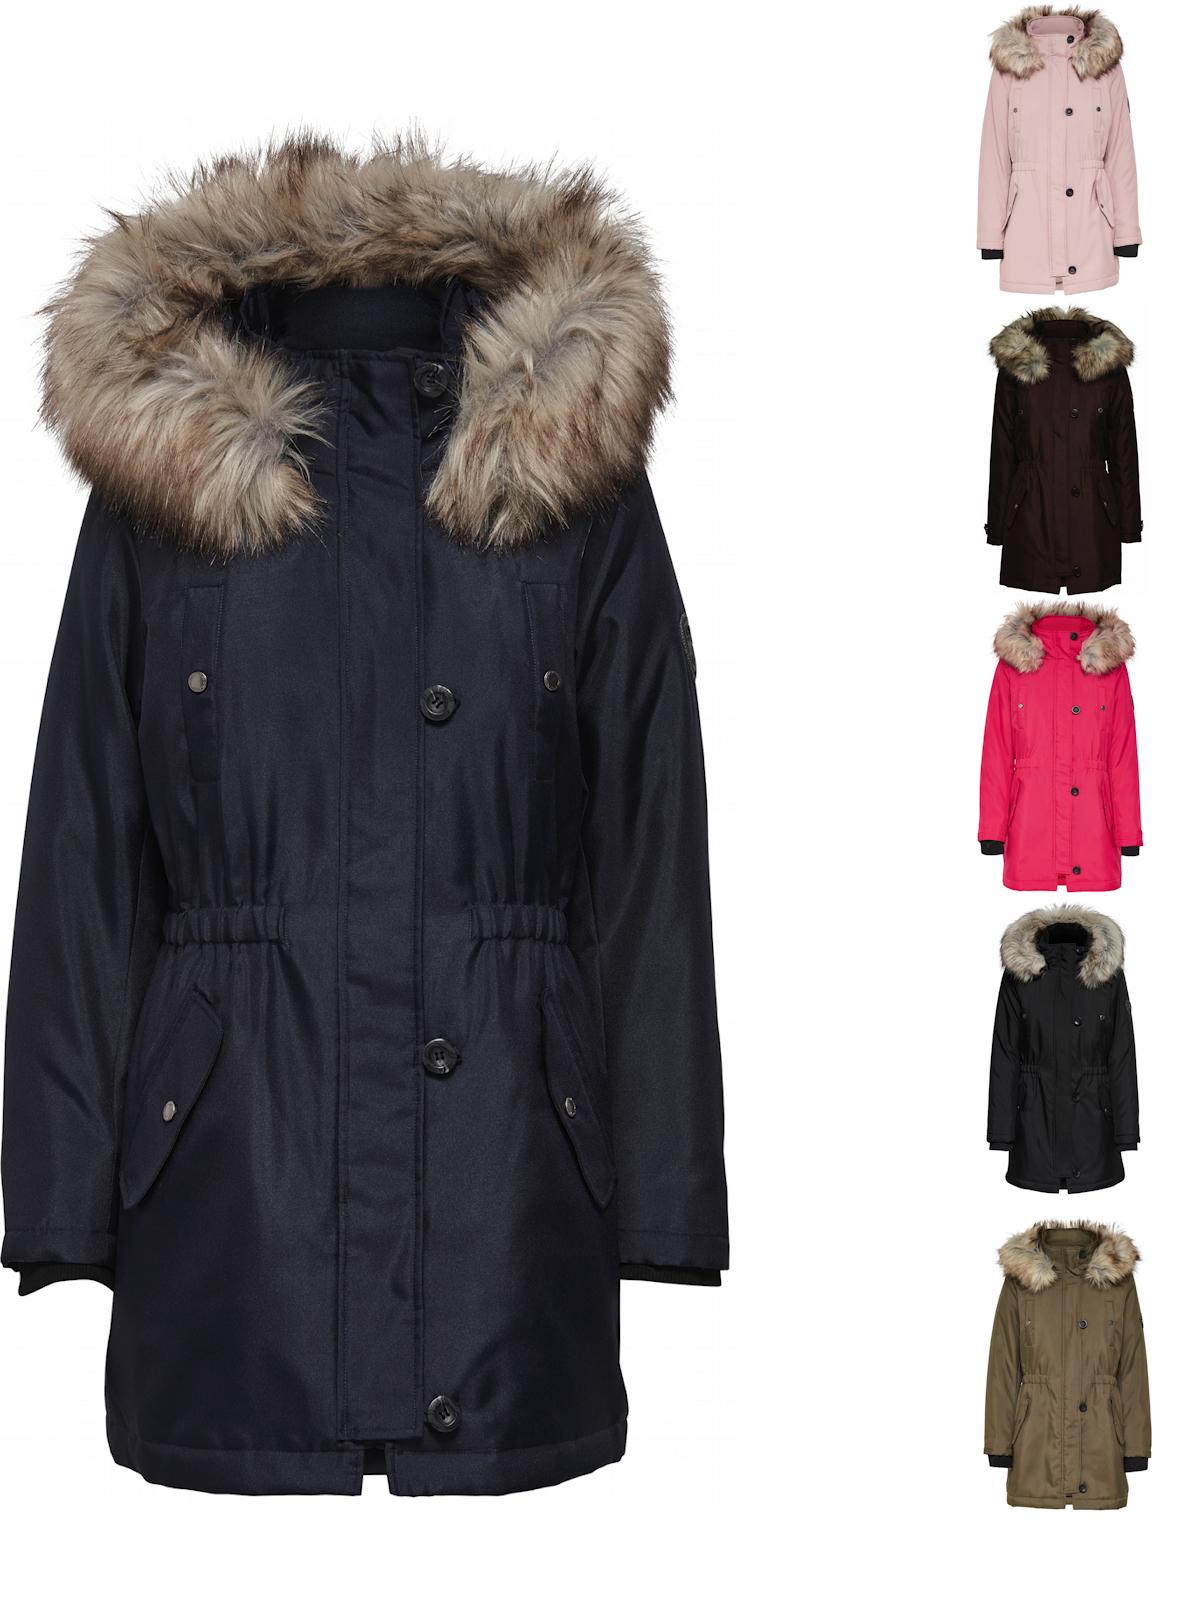 half off 3dc93 47040 Details zu Only Damen Winter Mantel onlIris Parka Jacke Fellkapuze modisch  elegant warm NEU